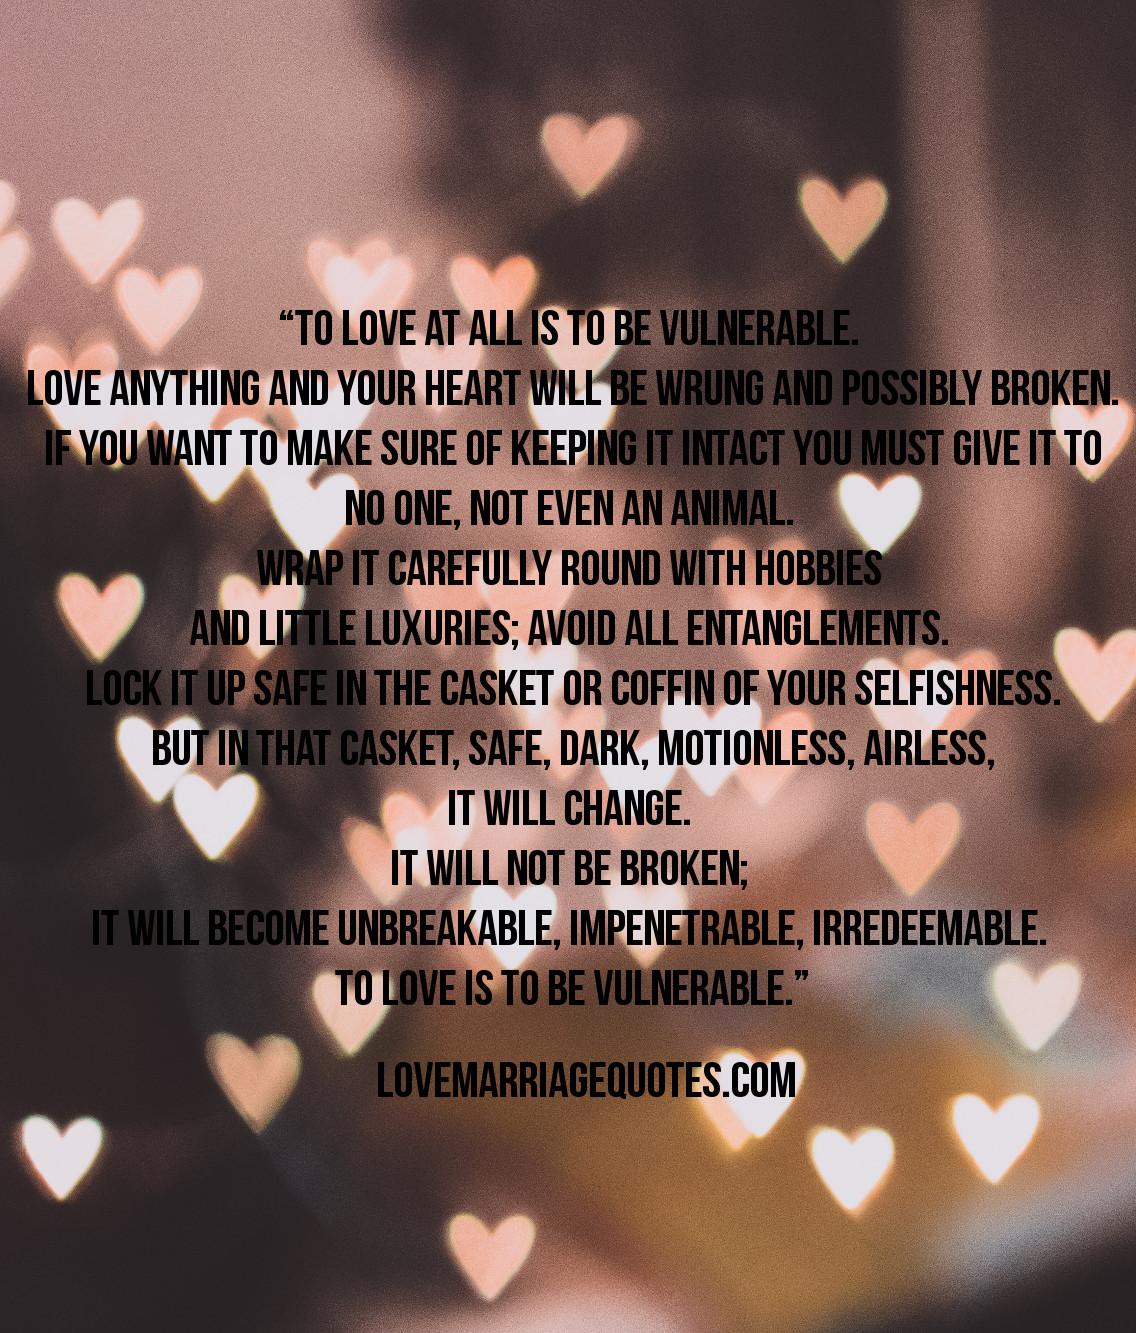 Love Quote C.S. Lewis